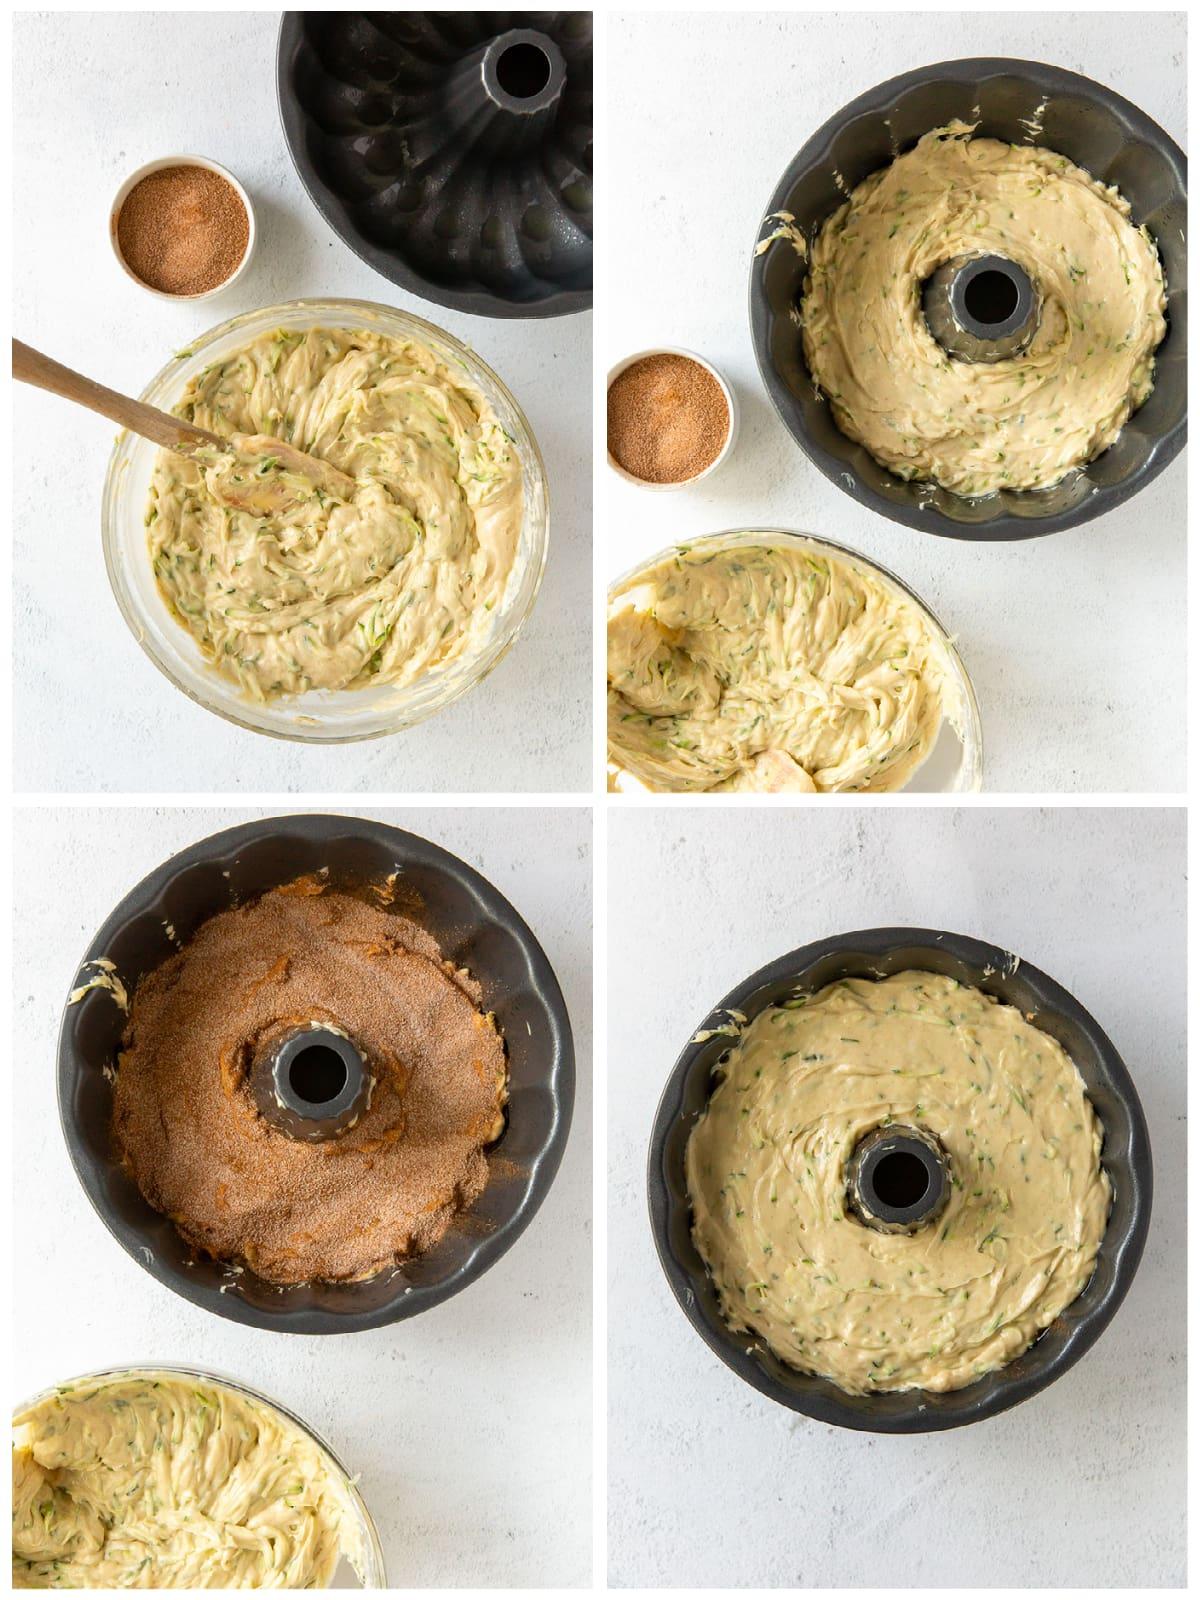 photo collage demonstrating how to add cinnamon swirl to zucchini bundt cake